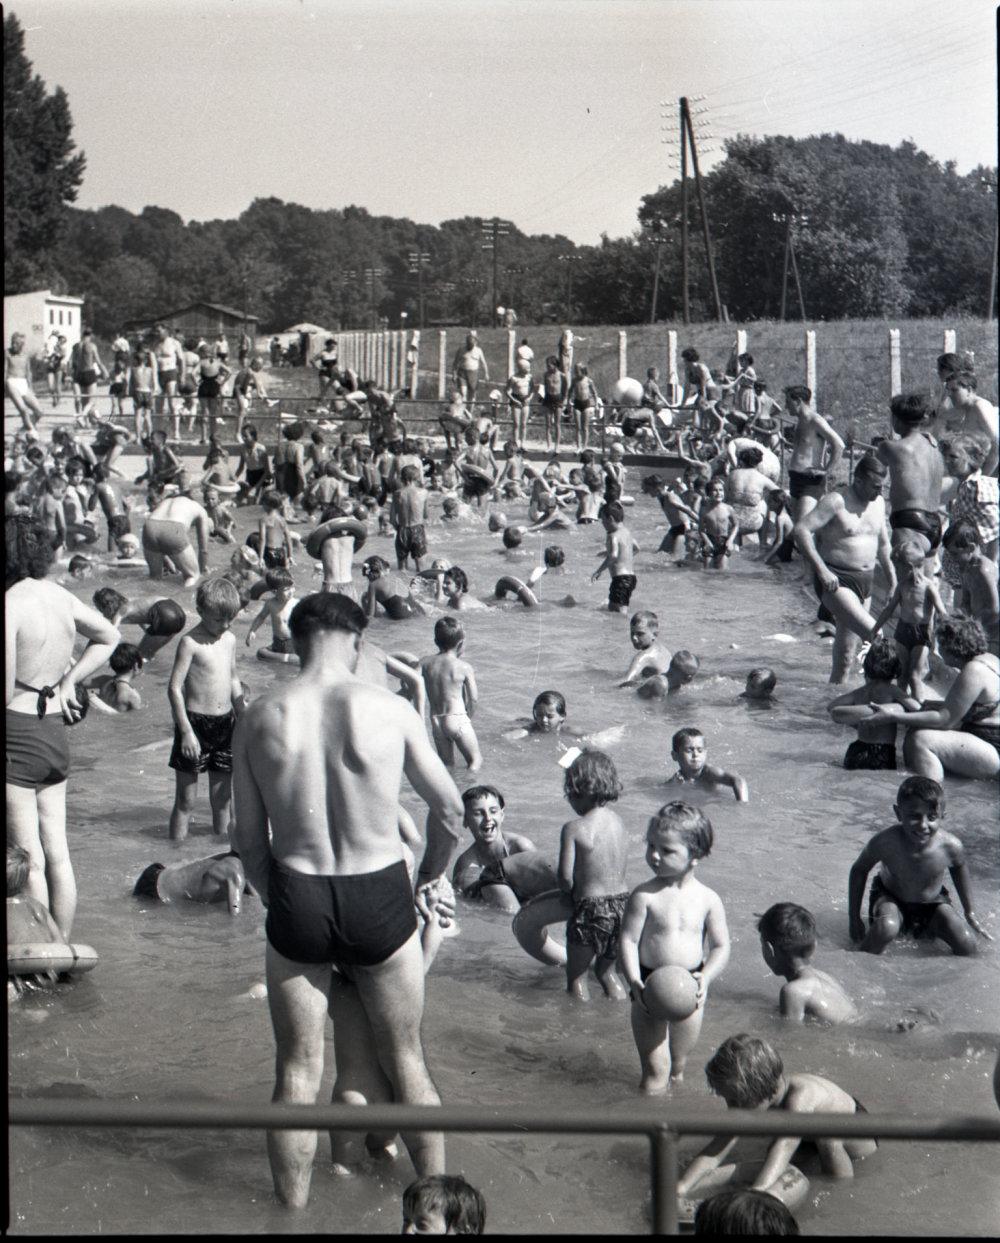 073_07 kupalisko LIDO v Petrzalke r1956